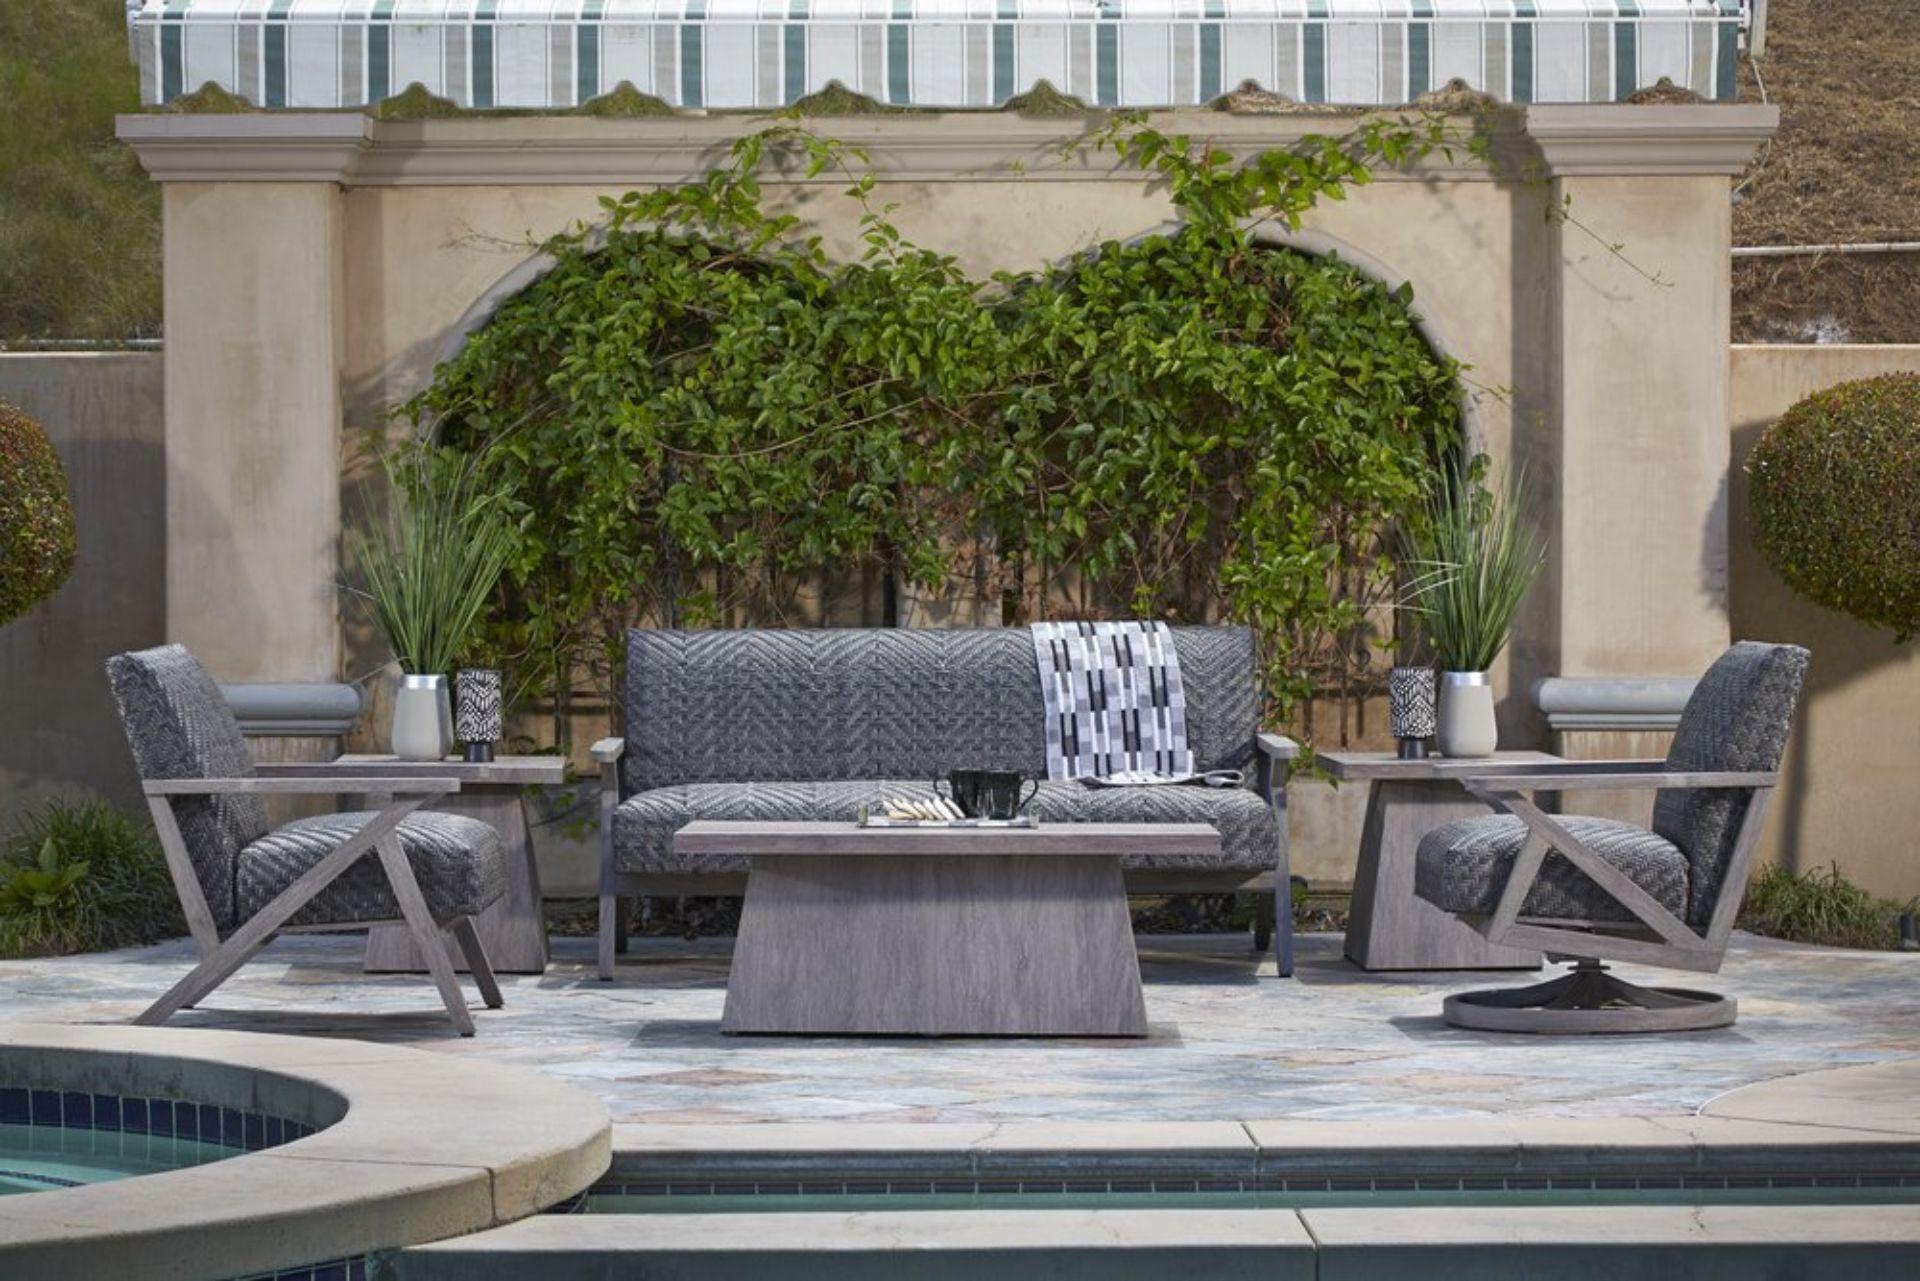 patio renaissance at absco fireplace